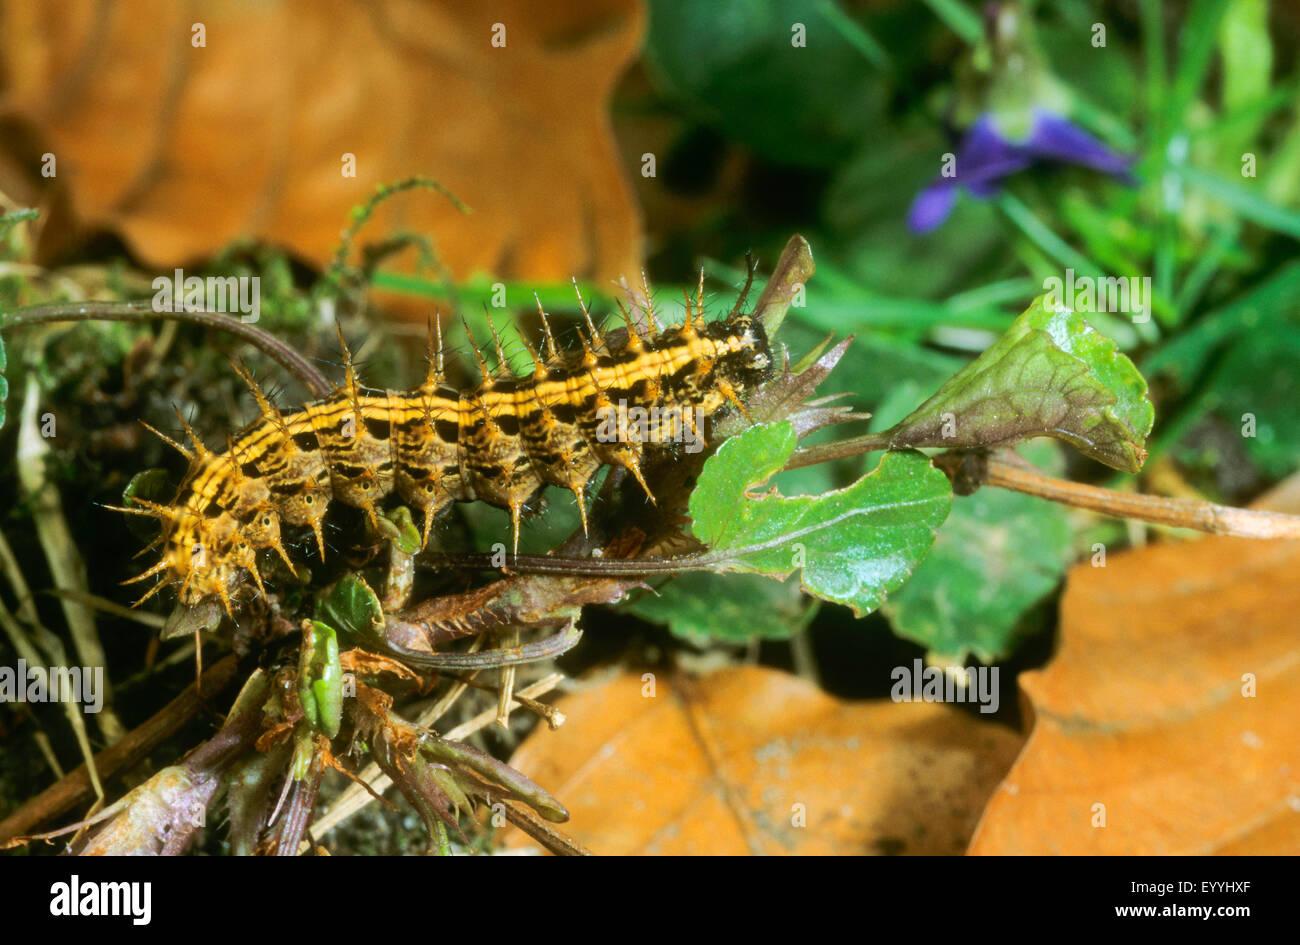 silver-washed fritillary (Argynnis paphia), caterpillar, Germany - Stock Image